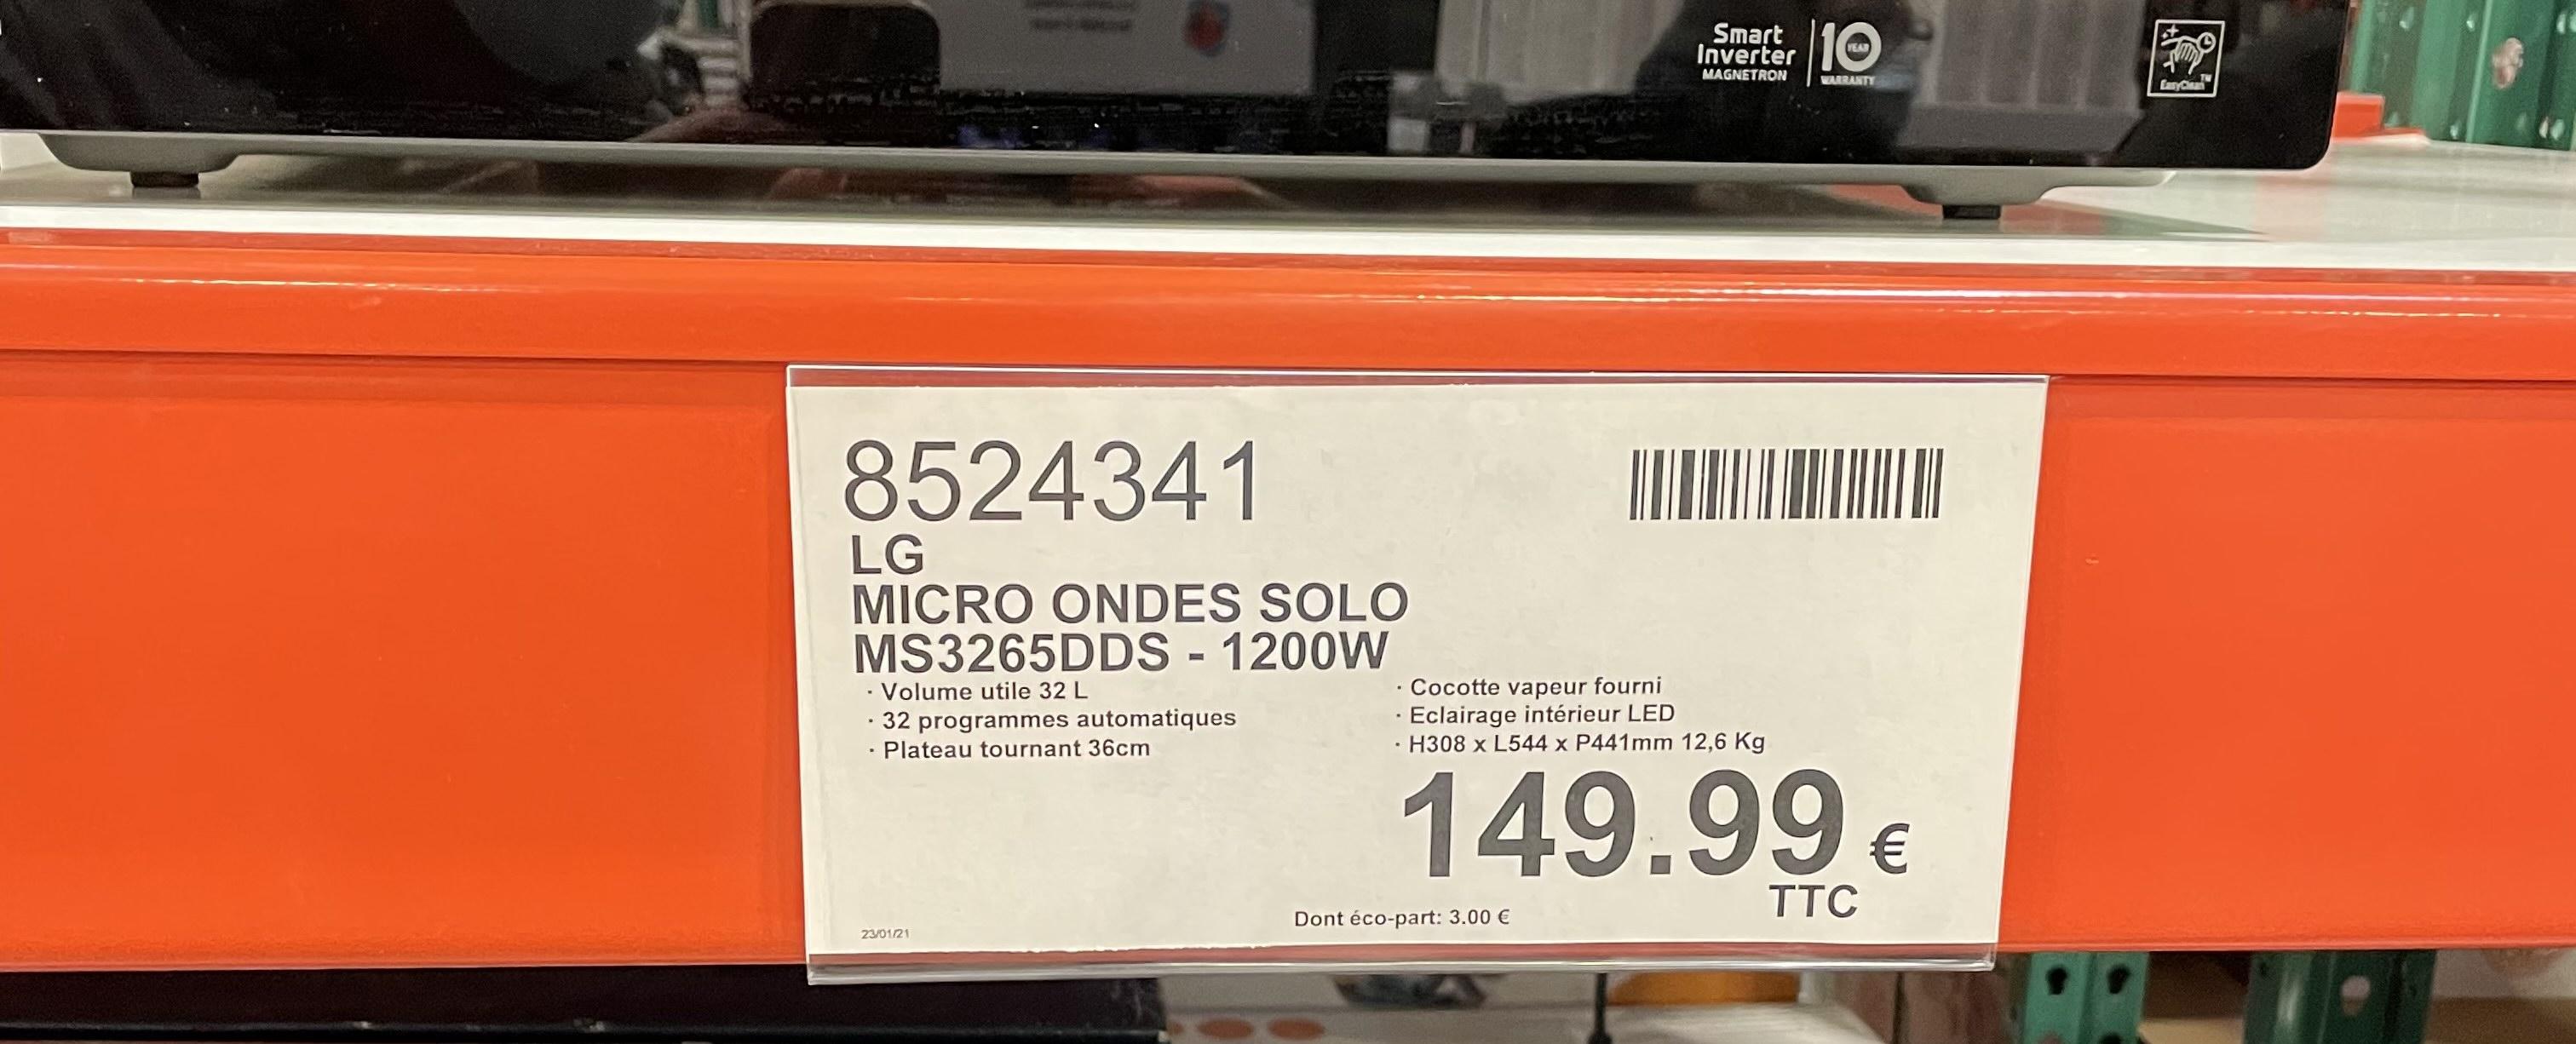 [Carte Costco] Micro-ondes LG Solo MD3265DDS - 1200W (Villebon-sur-Yvette 91)